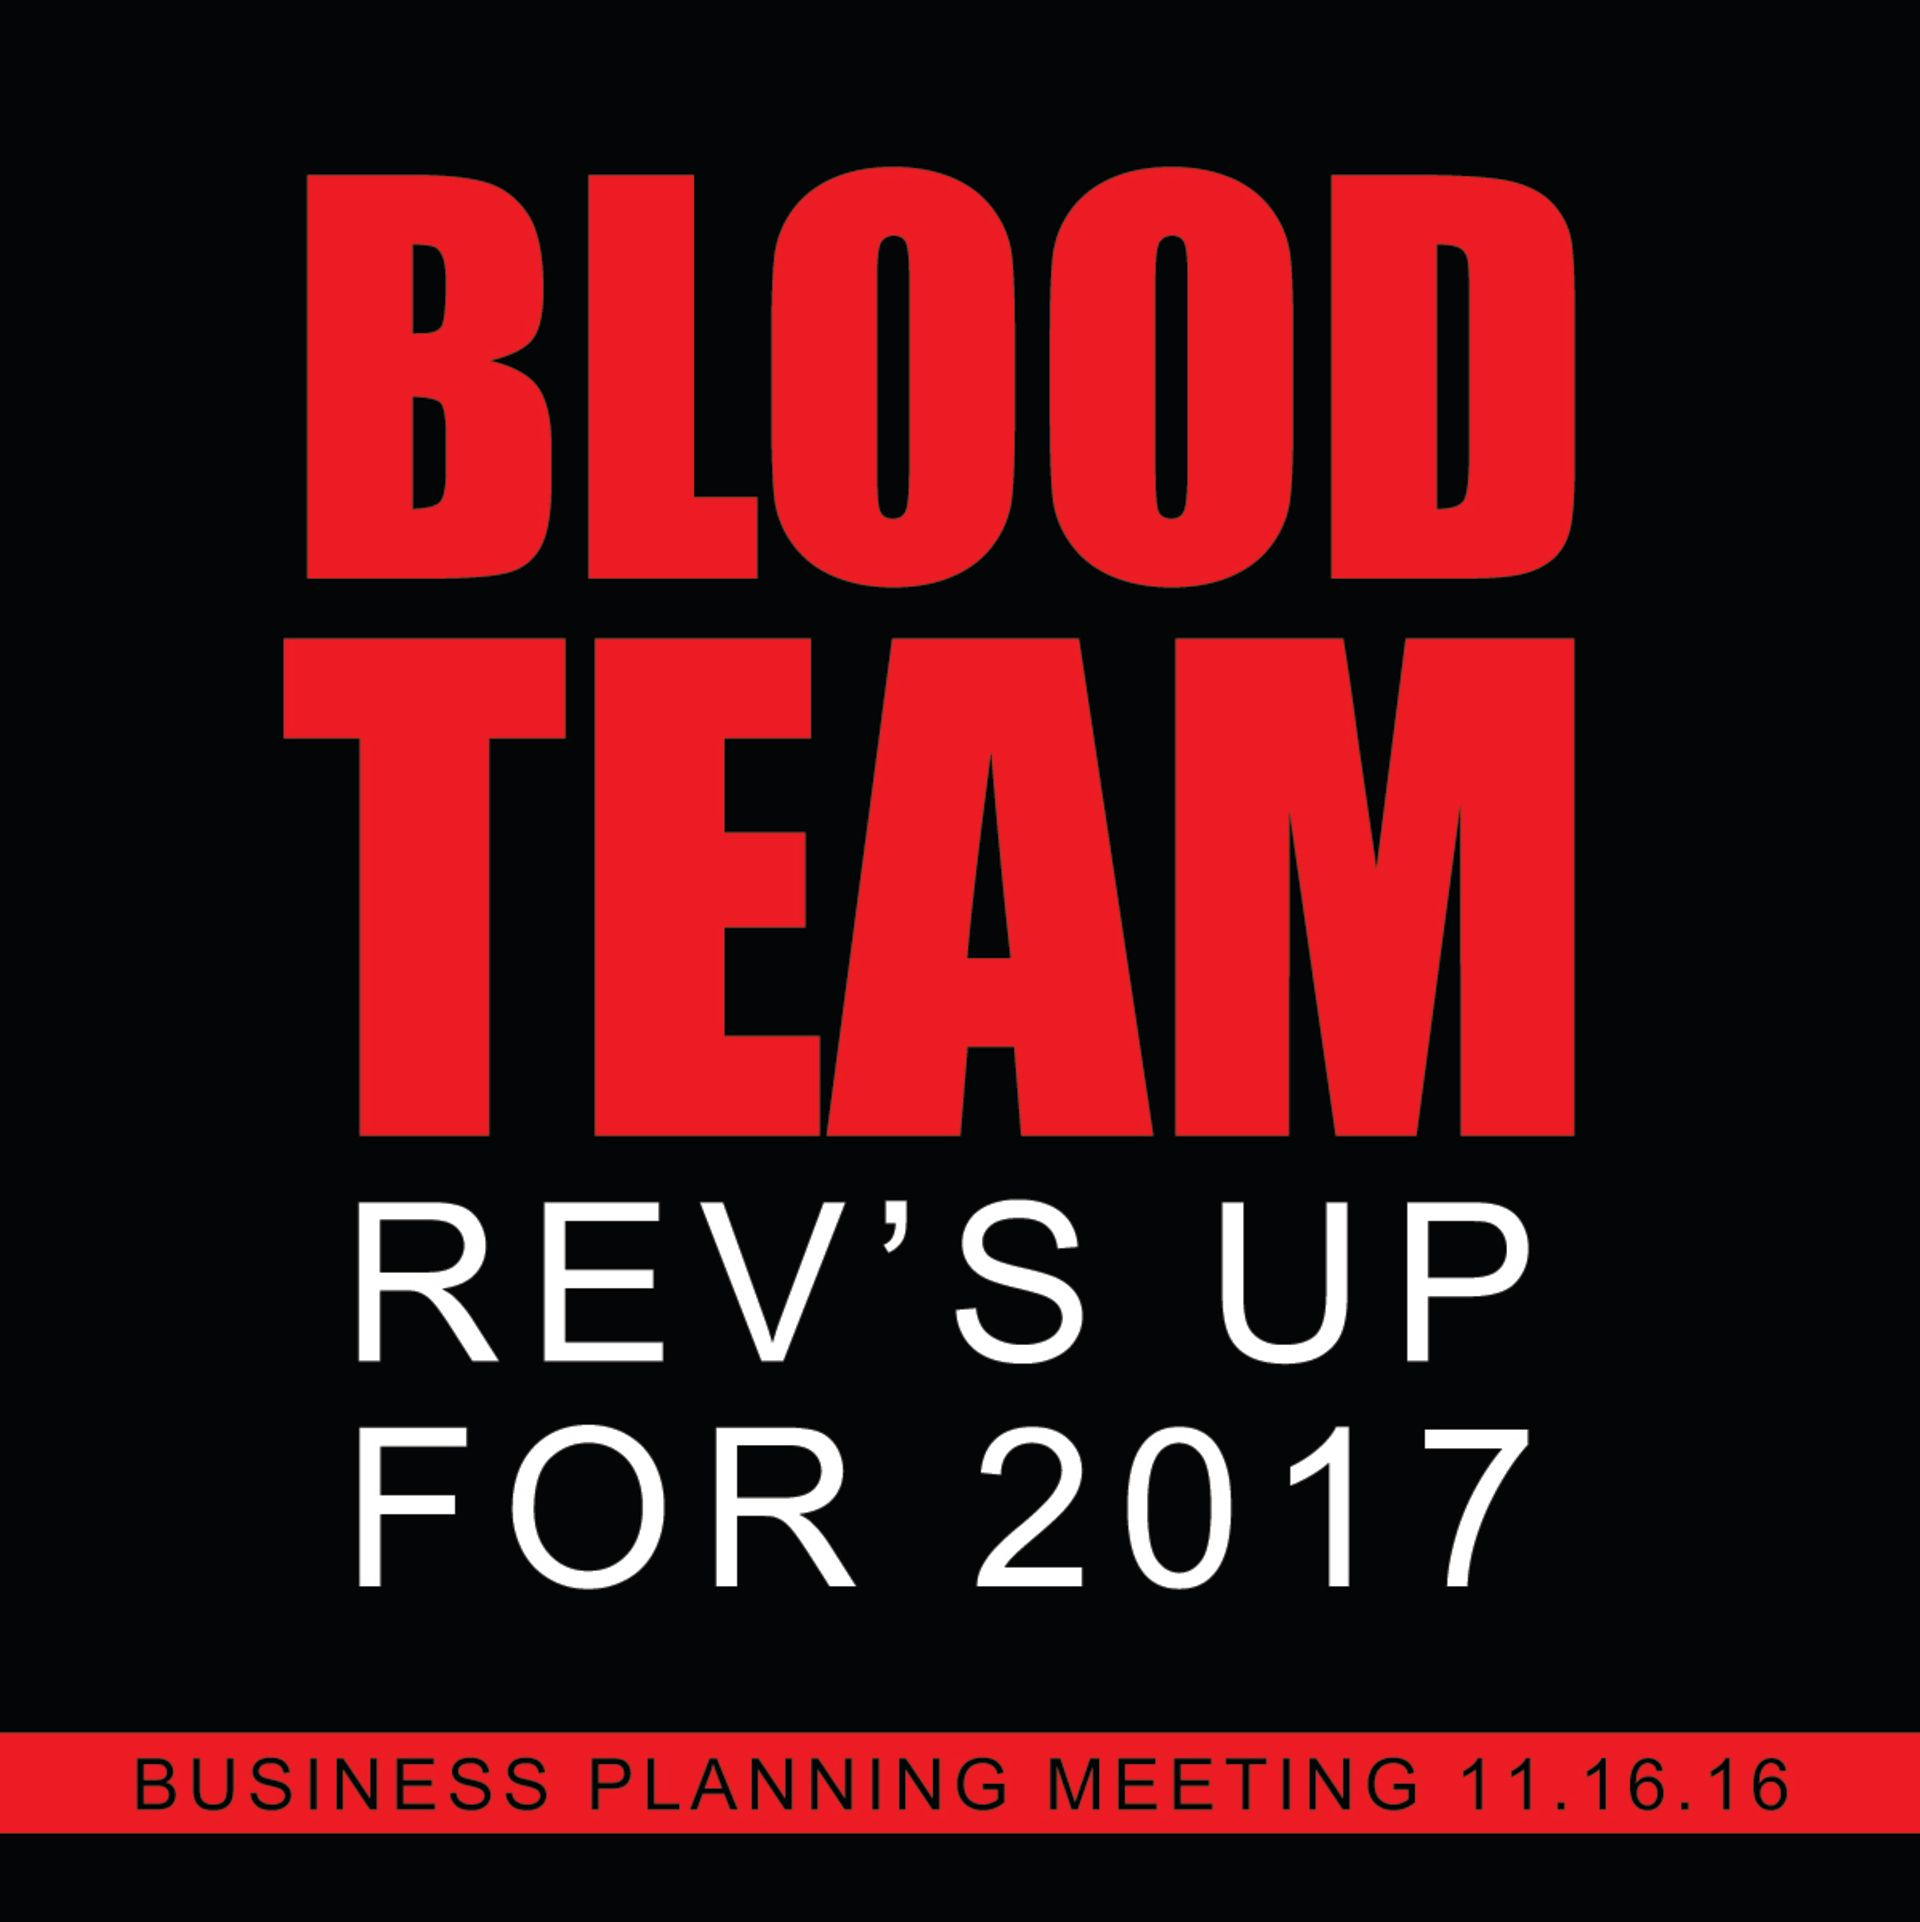 Blood Team Revs up for 2017